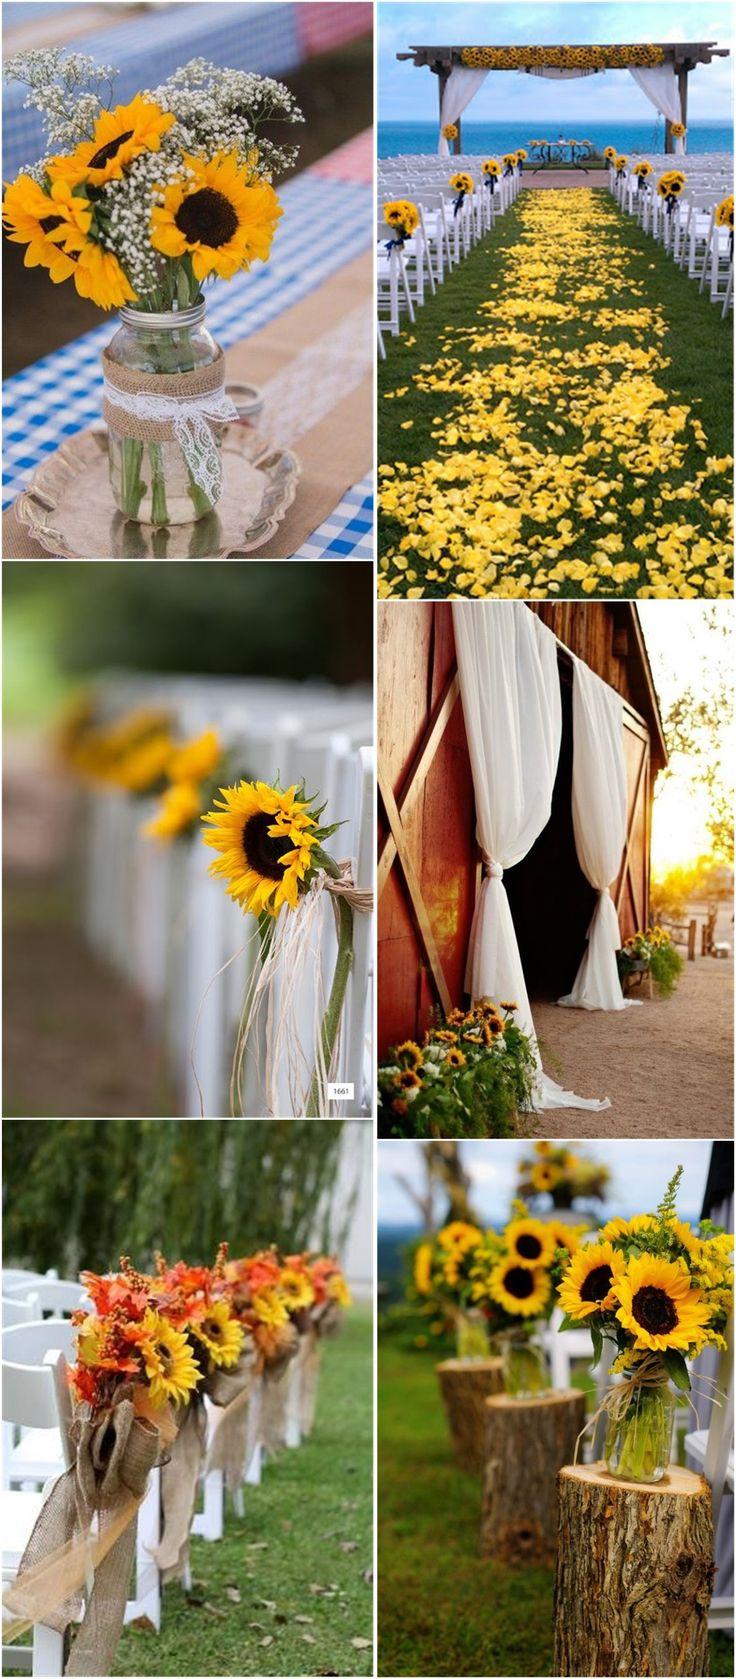 Best 25 Sunflower Wedding Decorations Ideas On Pinterest